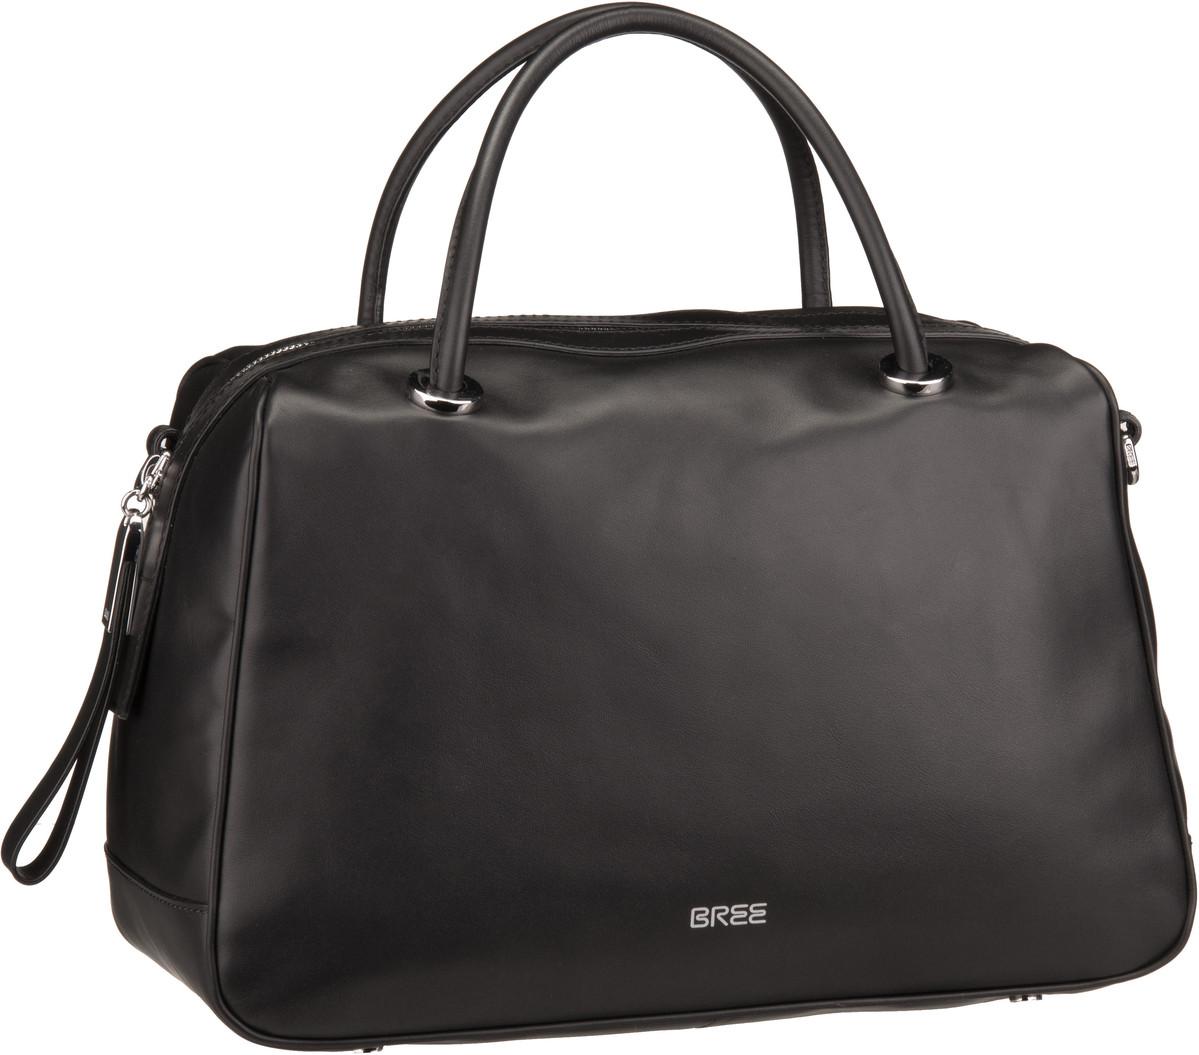 Bree Cordoba 5 Black - Handtasche